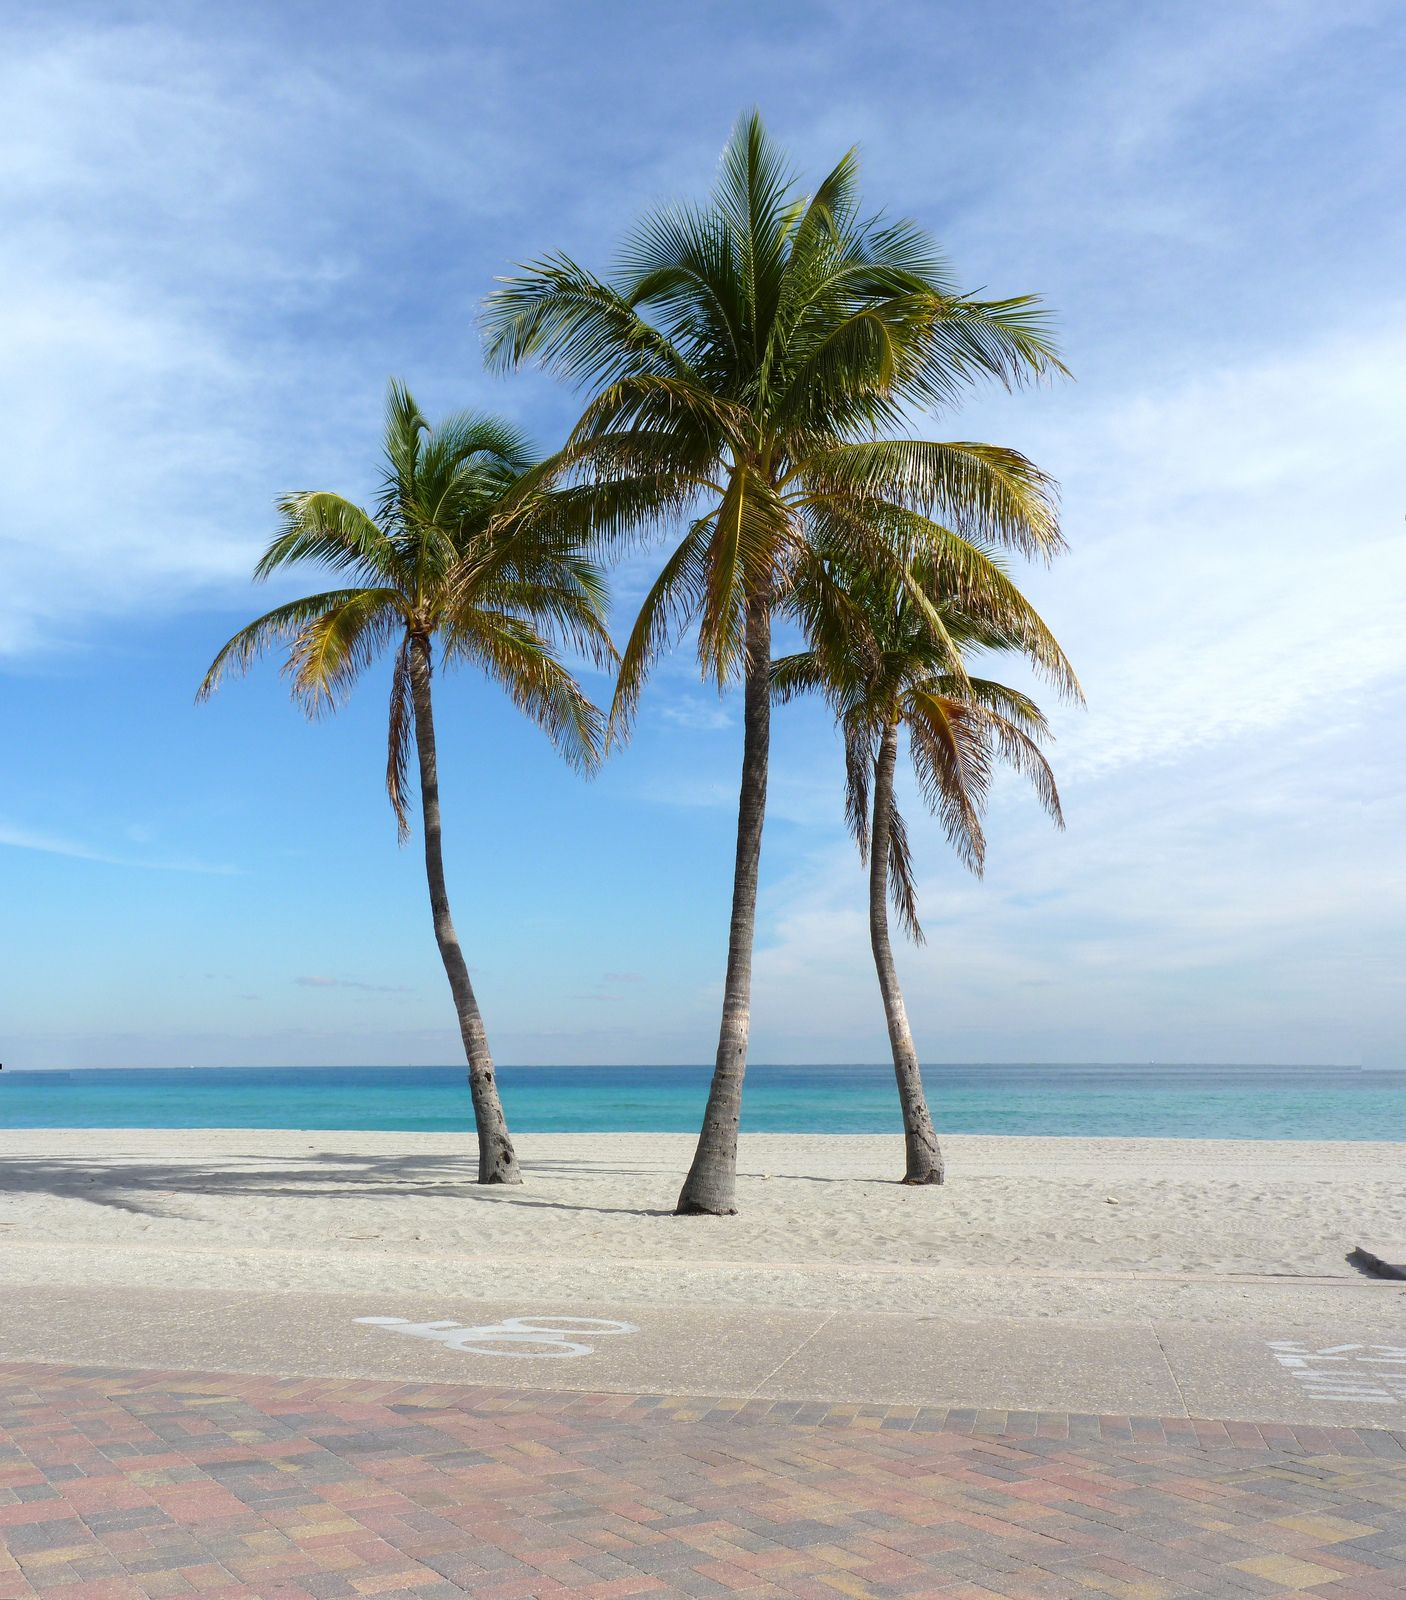 Florida Beach: Florida Beaches For Families - GroupTours.net